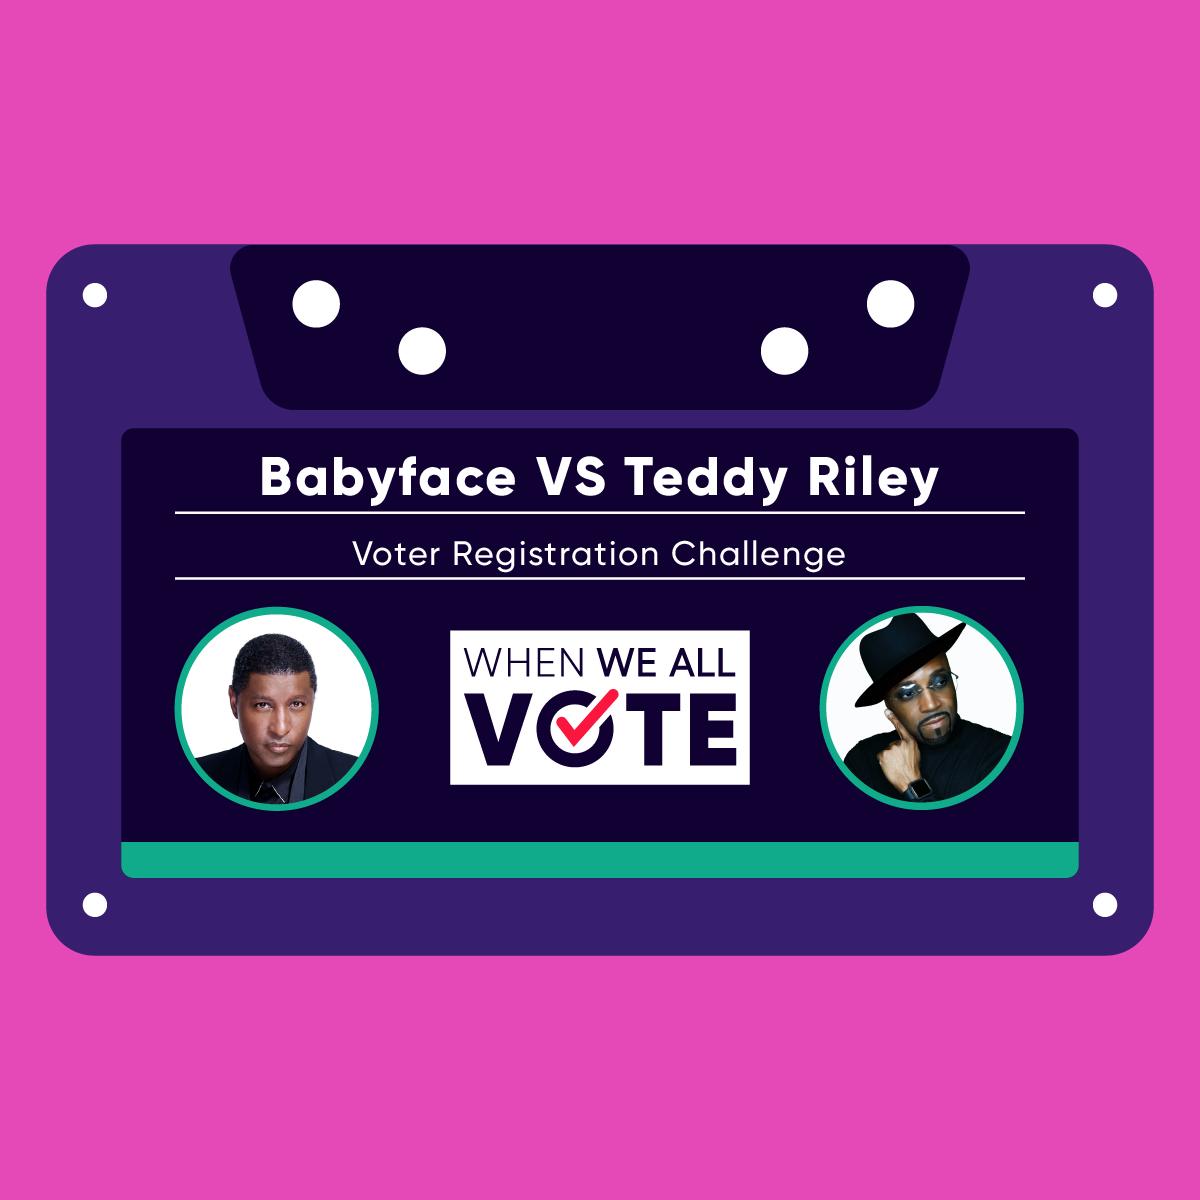 Teddy Riley vs Babyface When We All Vote